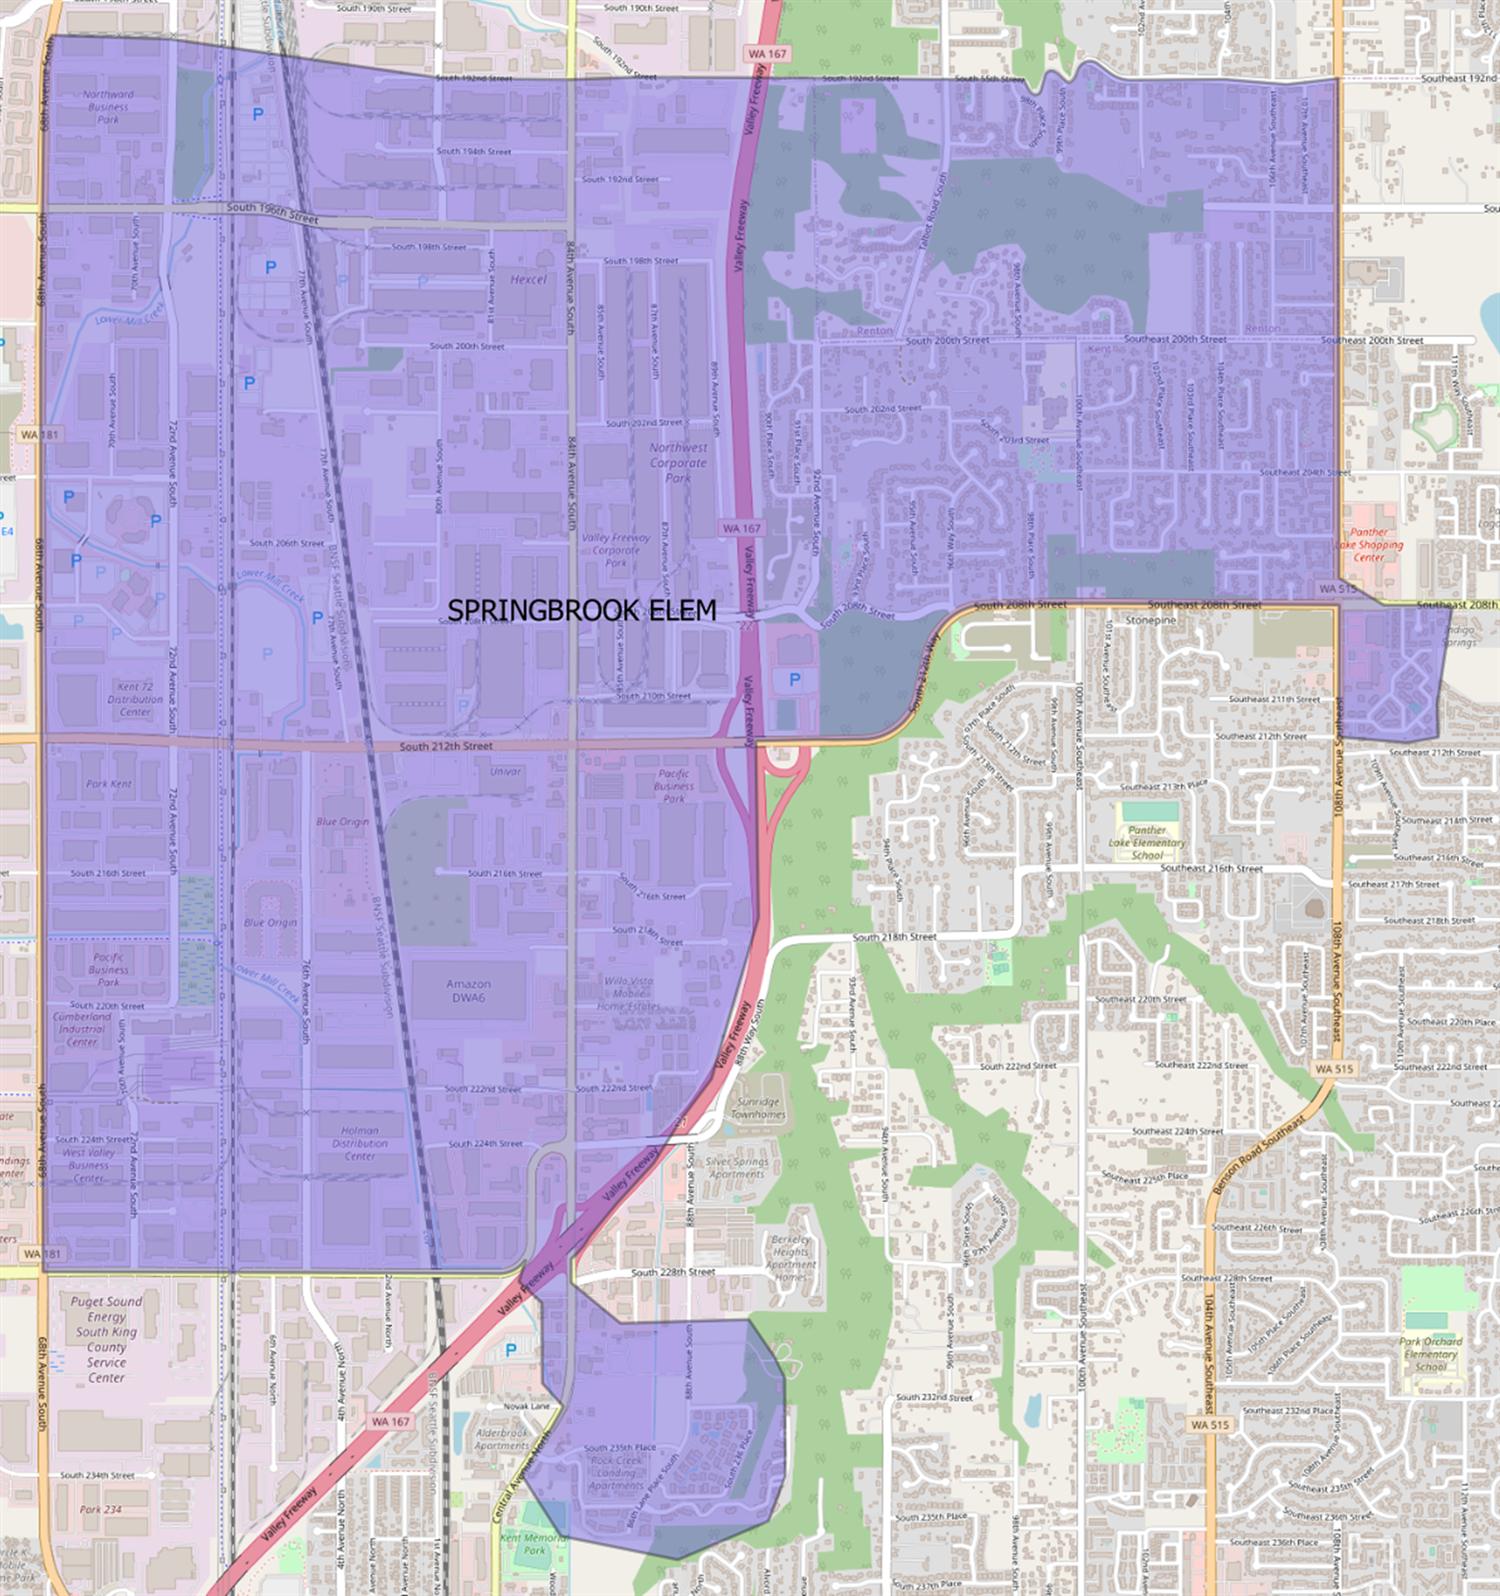 Current Springbrook Elementary boundary map